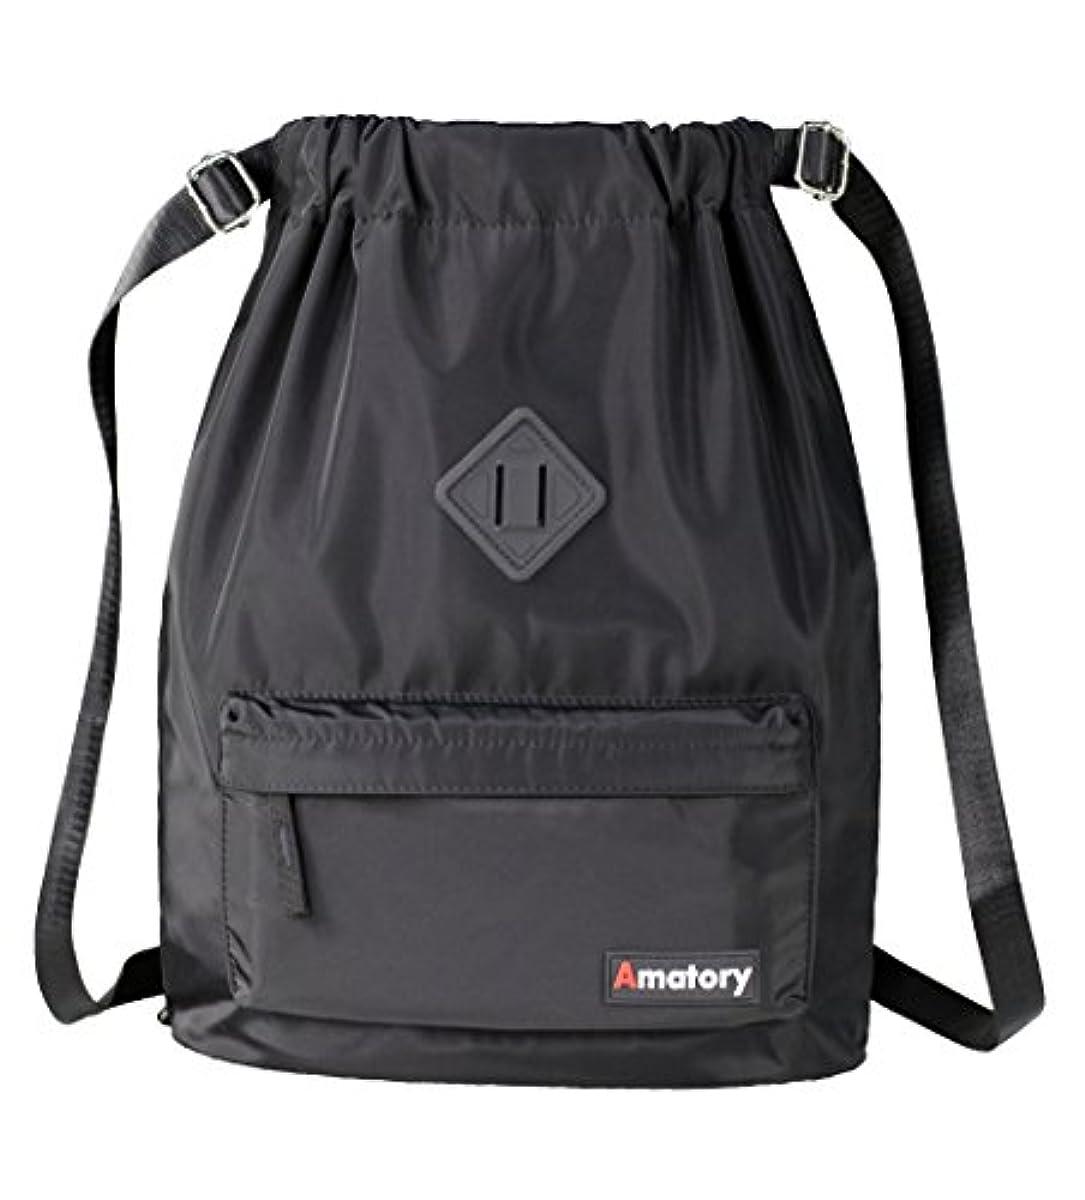 Amatory Drawstring Backpack String Bag Waterproof Gym Sports Cinch Sack  Sackpack d9dd738fb